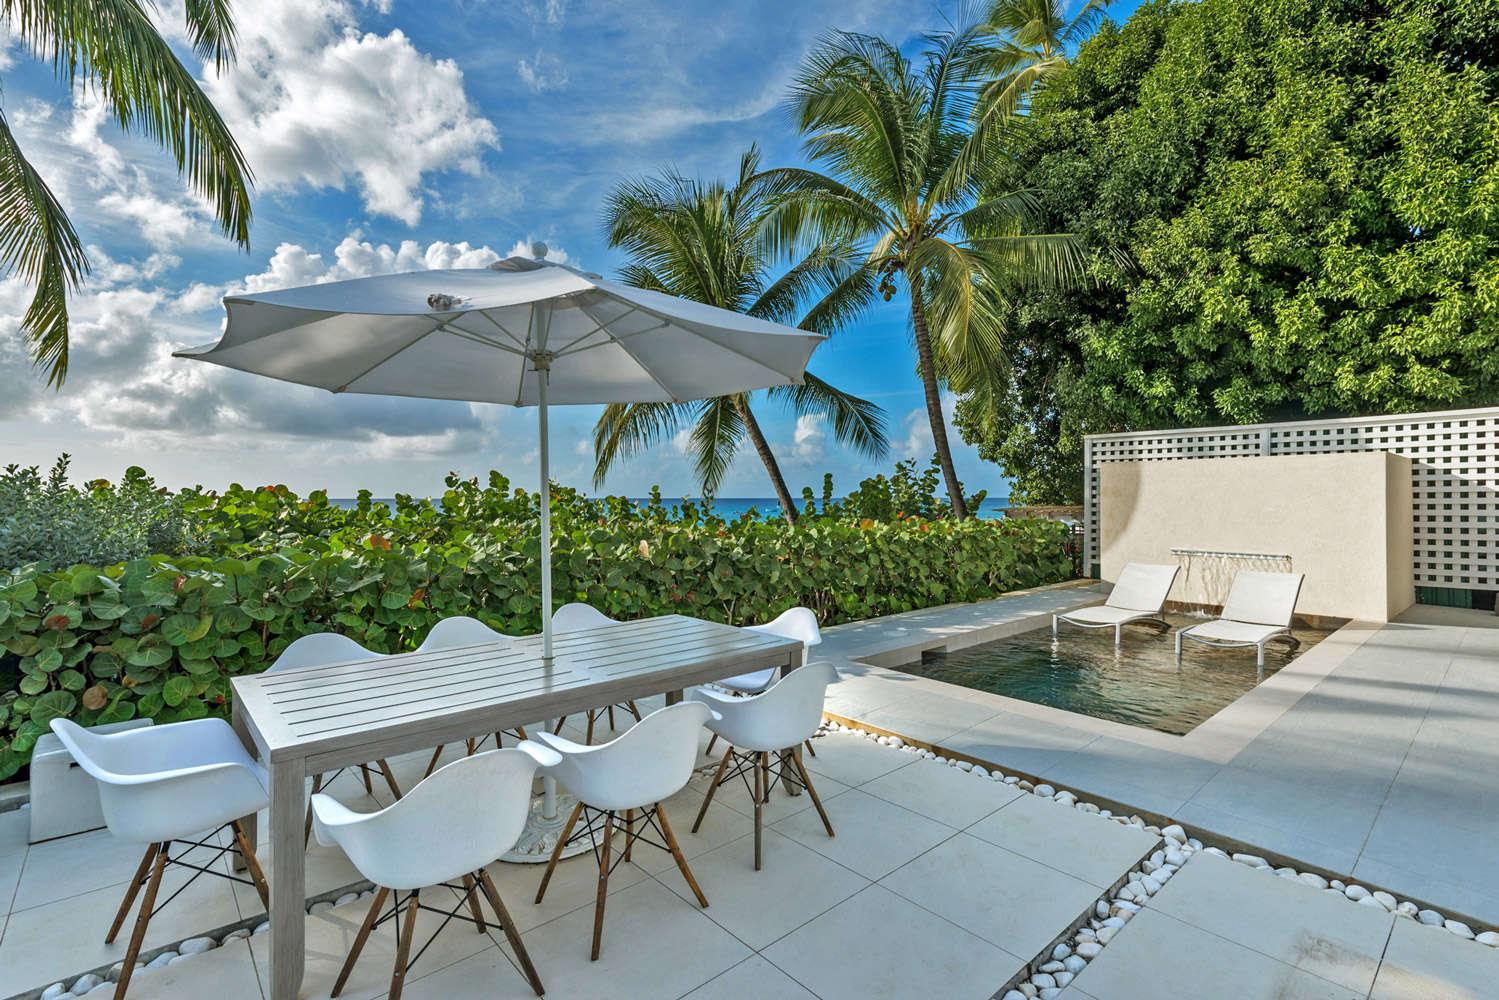 Luxury villa rentals caribbean - Barbados - St james - The garden - Footprints - Image 1/14